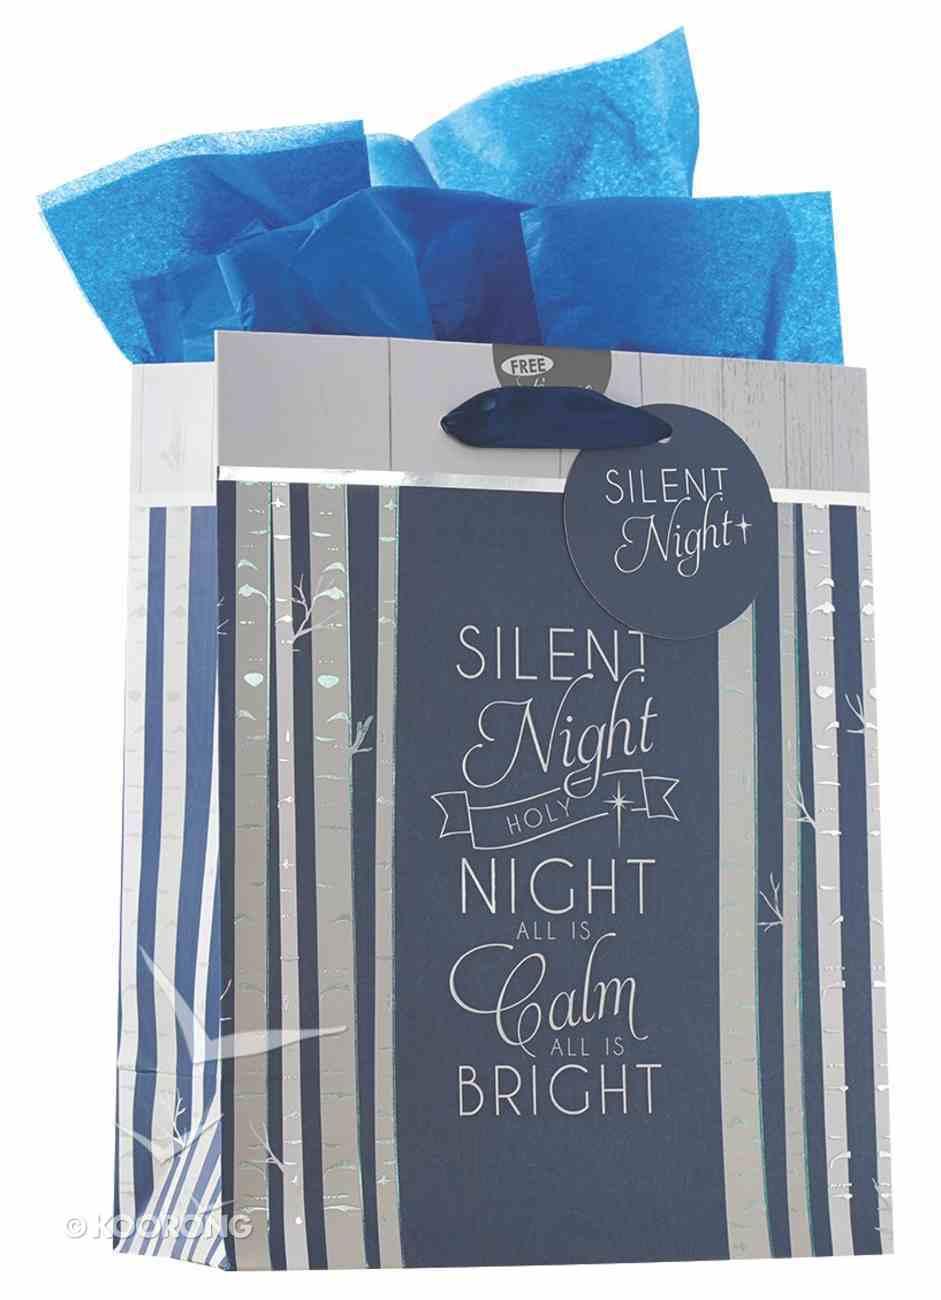 Christmas Gift Bag Medium: Silent Night With Tissue Paper, Gift Tag & Satin Ribbon Handles Stationery